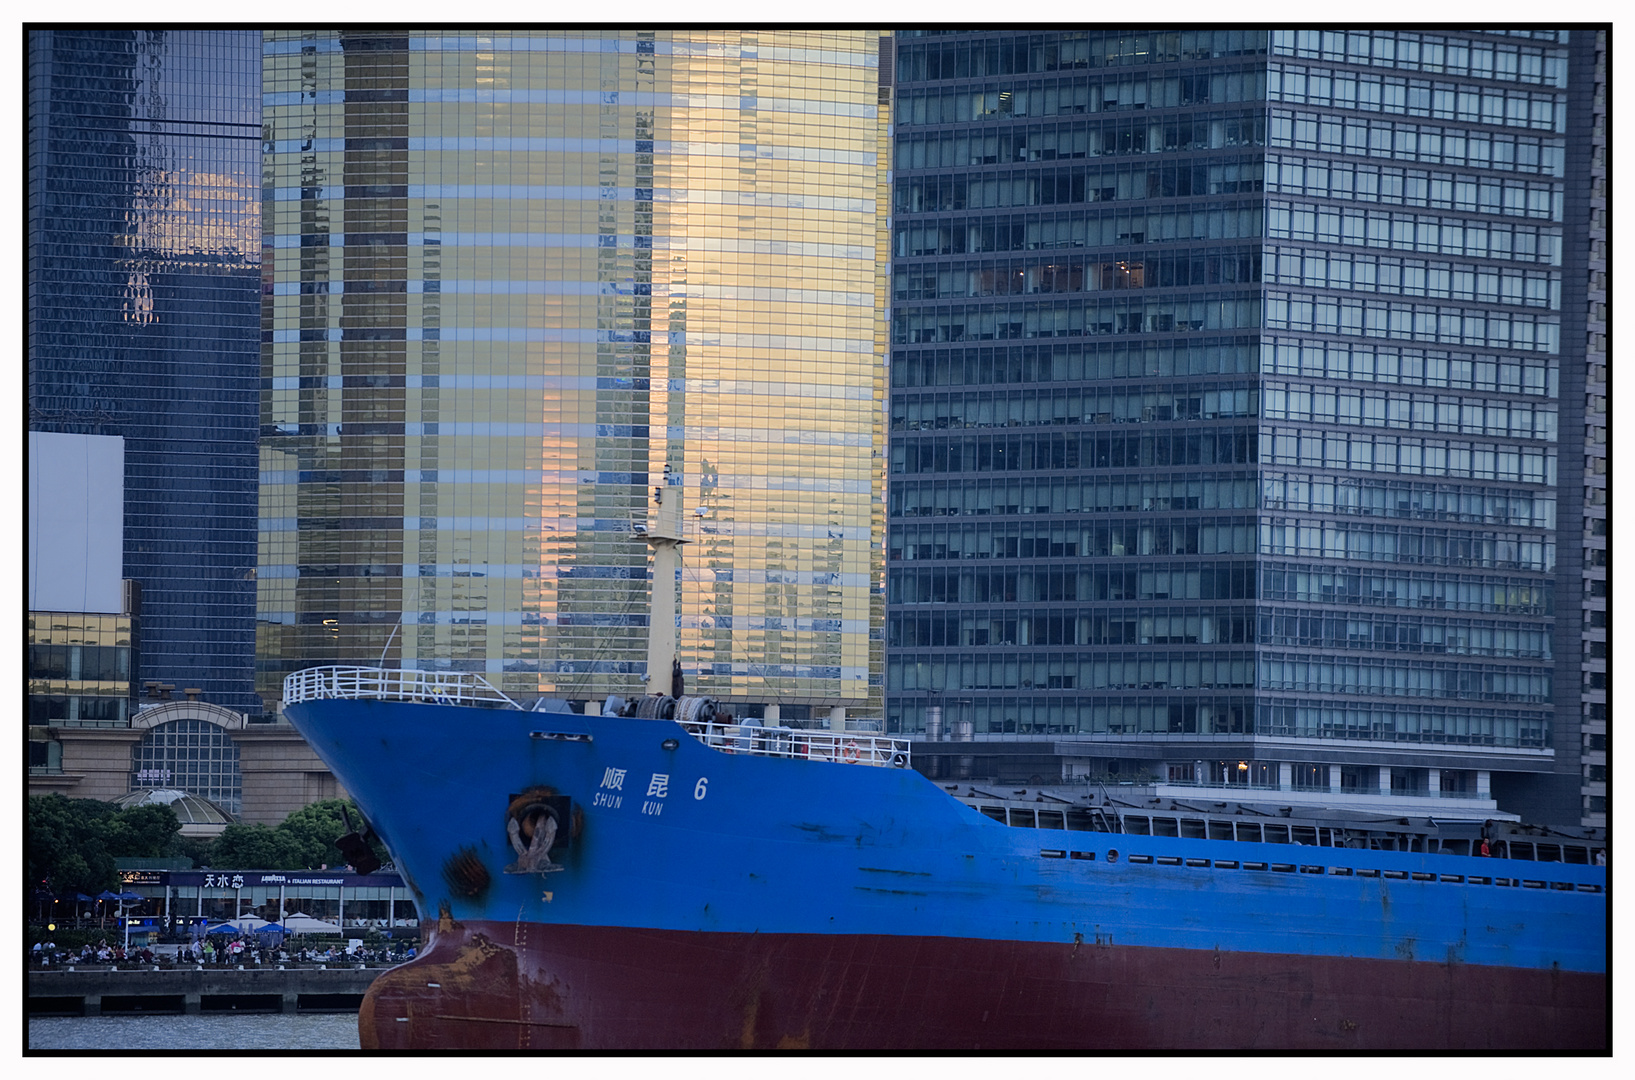 Pudong blues